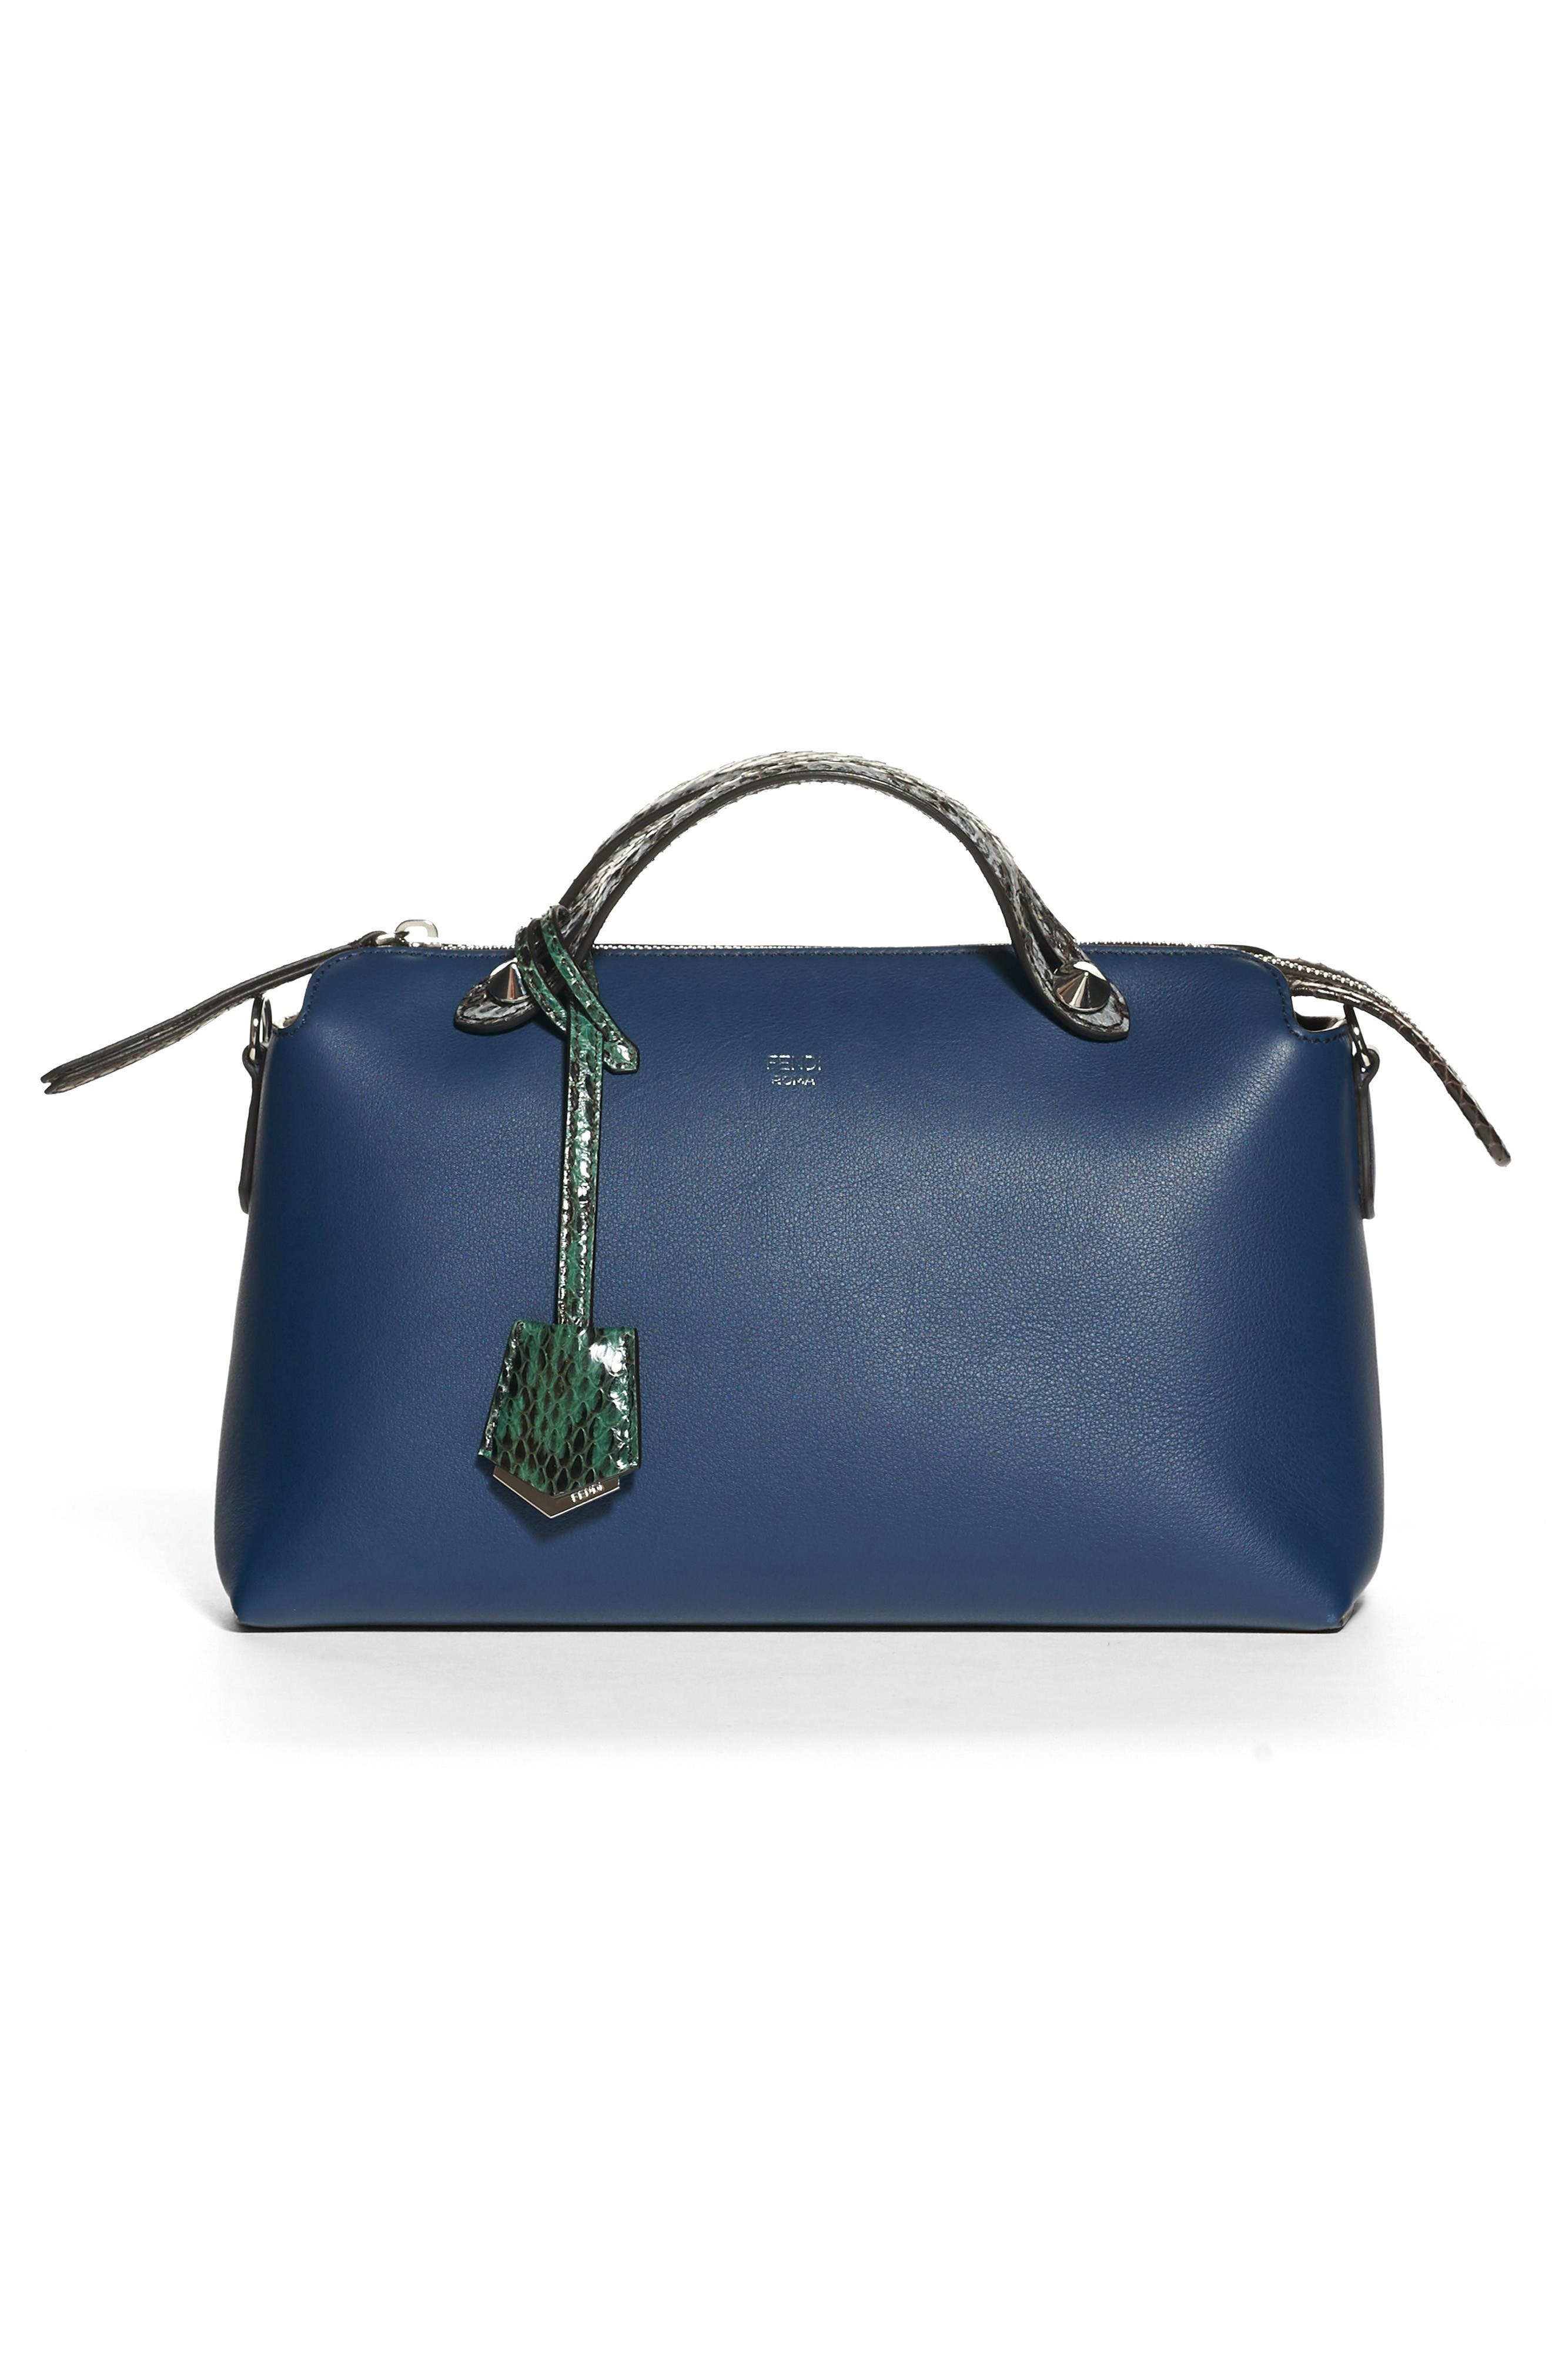 Fendi 'Medium By the Way' Calfskin Leather Shoulder Bag with Genuine Snakeskin Trim